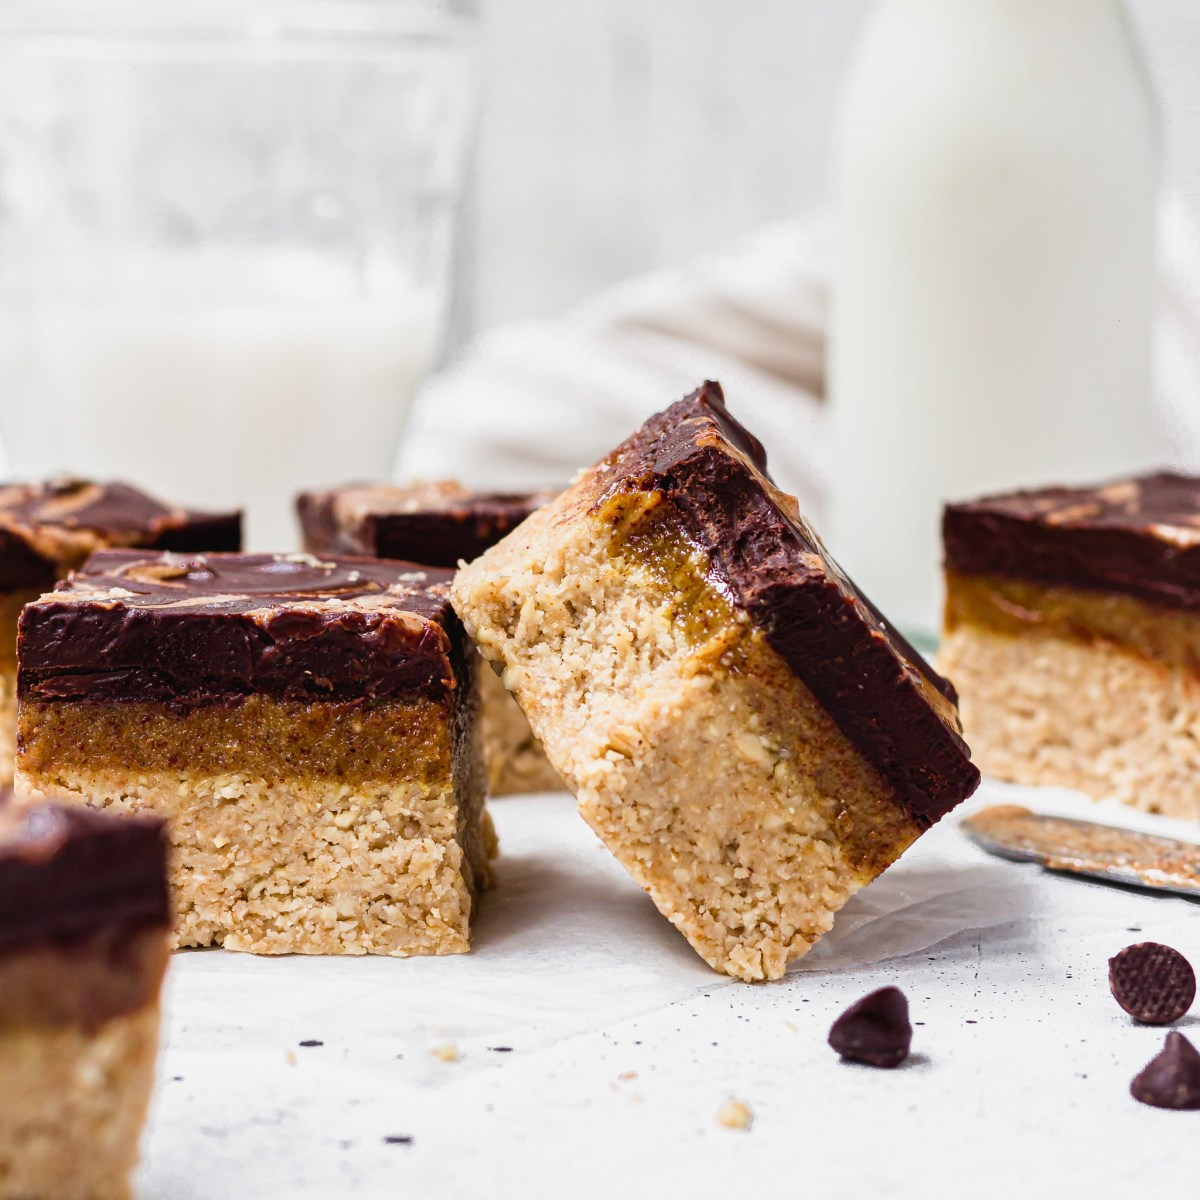 Ginger Chocolate Caramel Slices